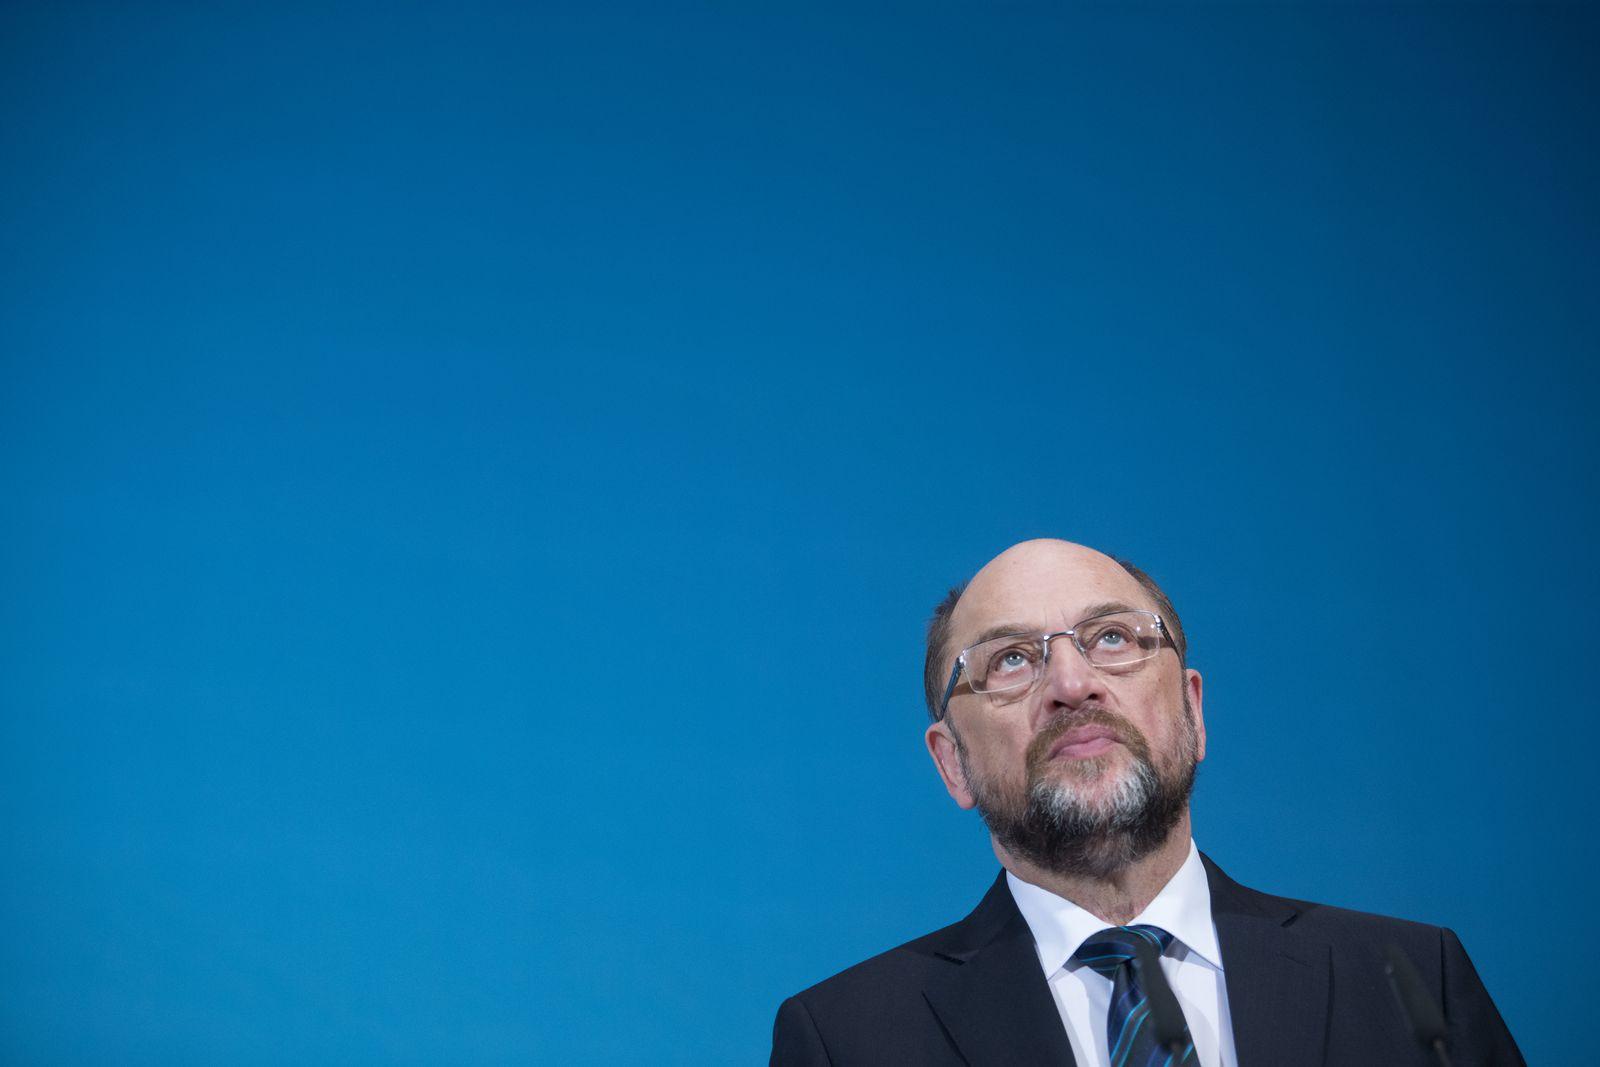 Schulz/ Sondierung/ GroKo/ Berlin / Spd